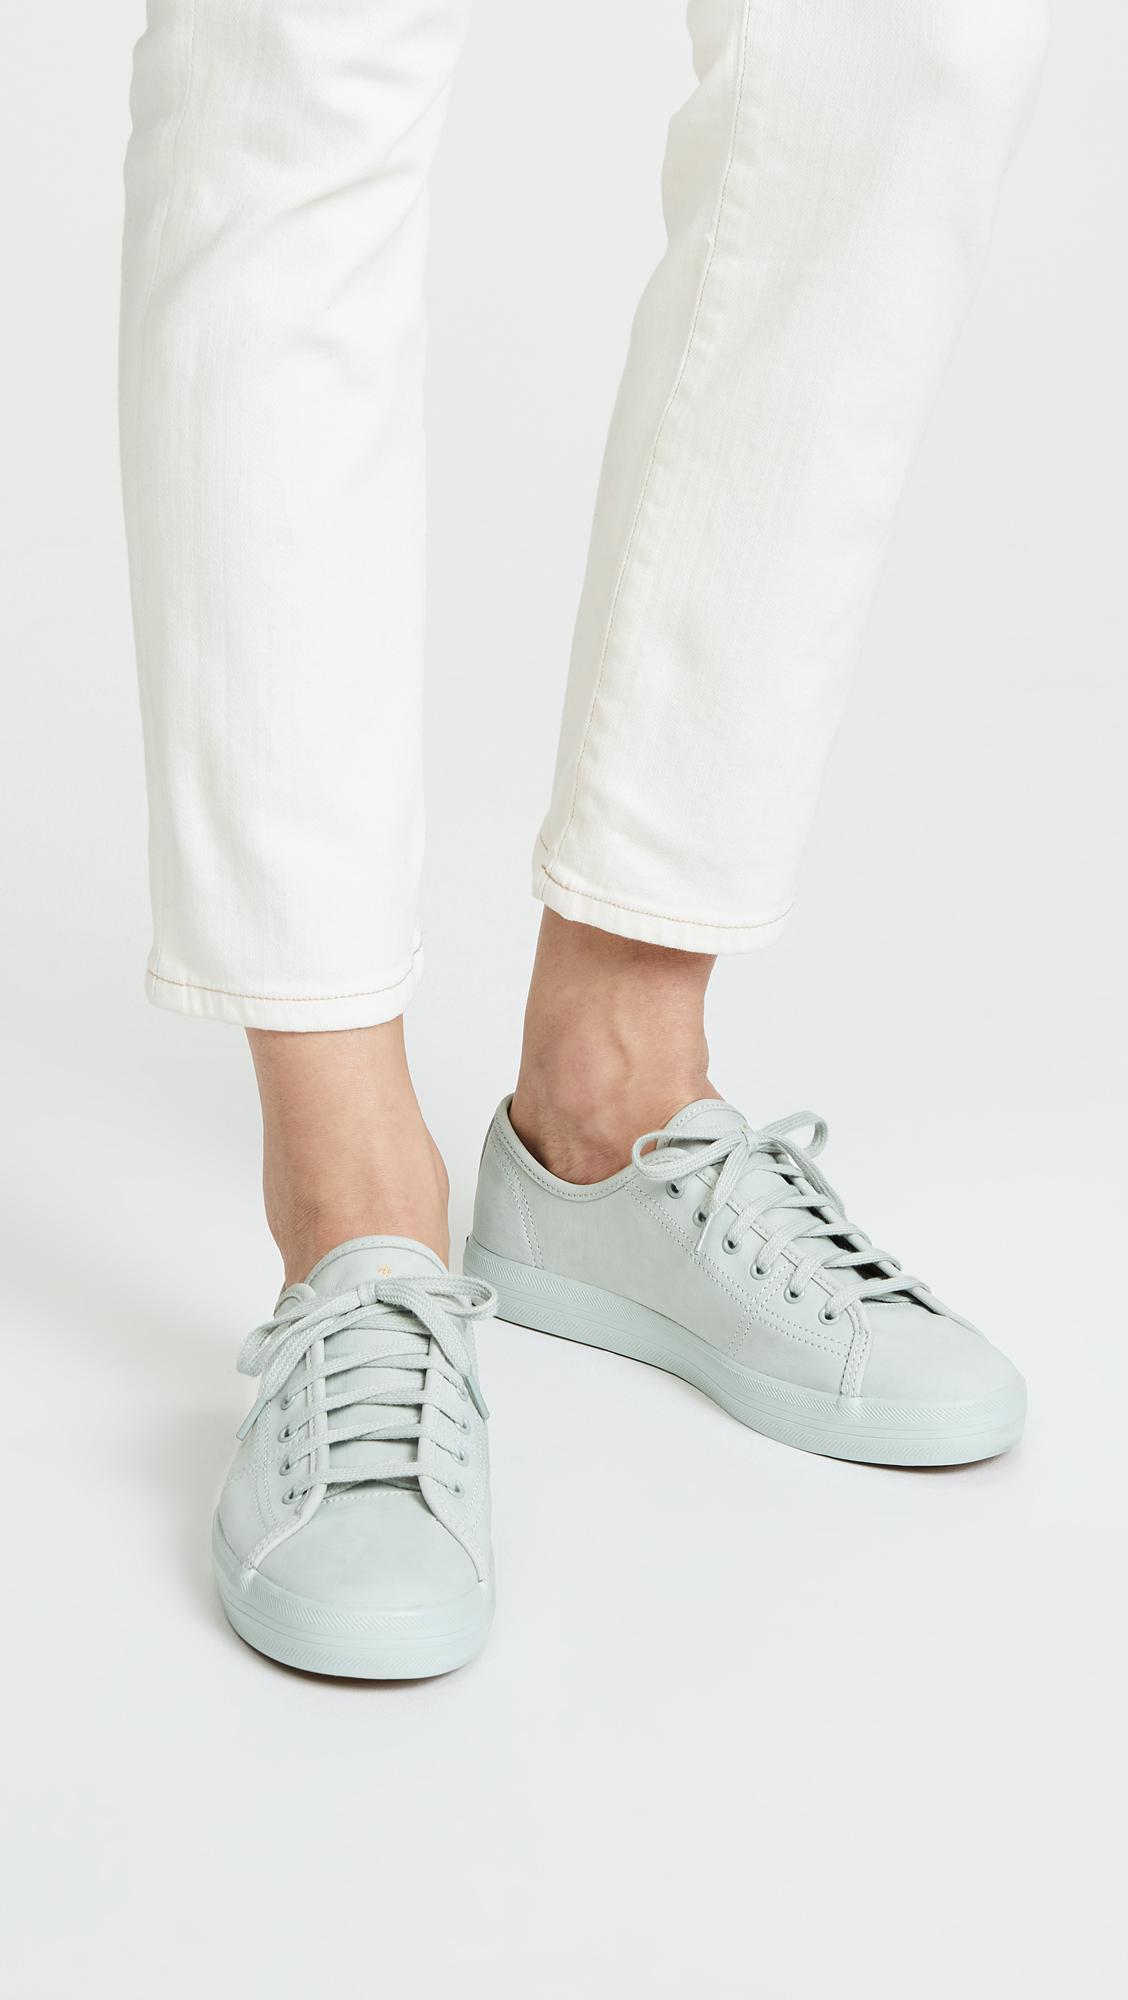 2c348b9fe4de Keds X Kate Spade New York Kickstart Sneakers in Green - Lyst